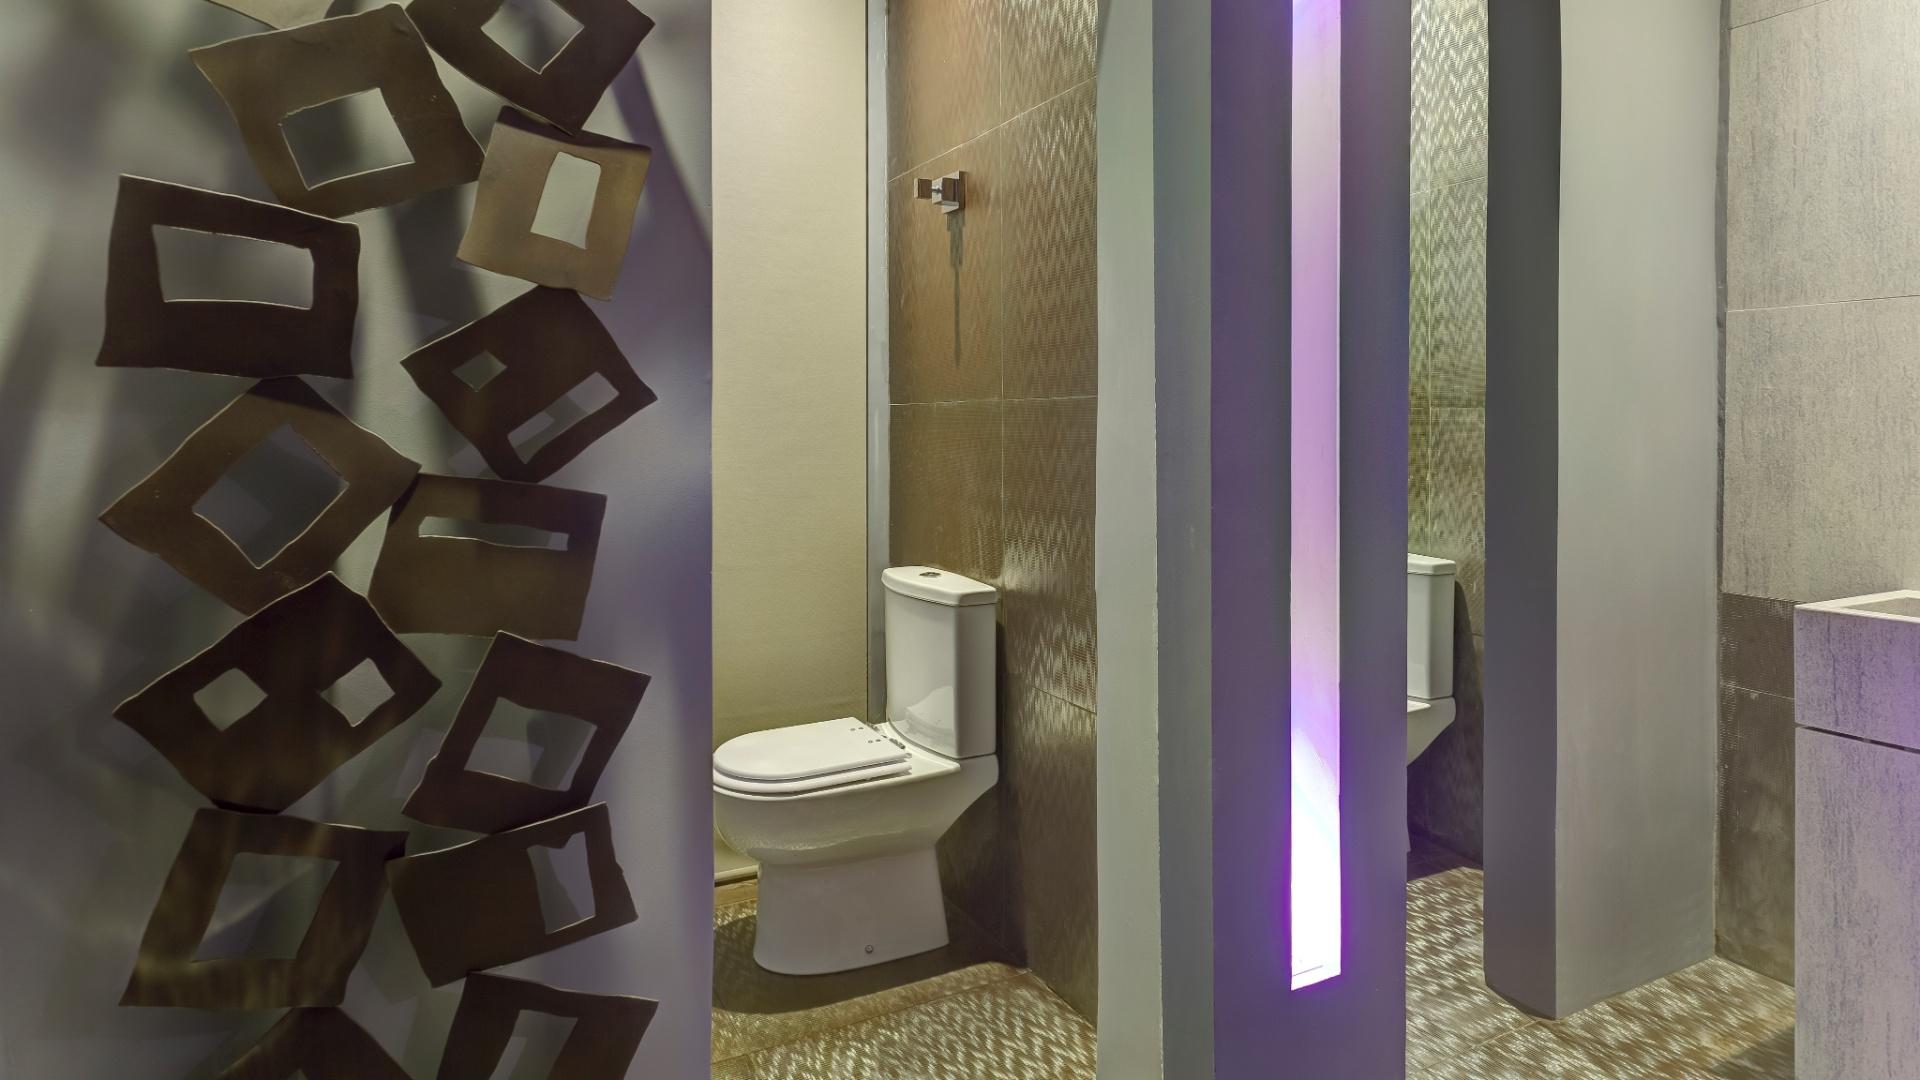 uol decoracao lavabo:Lavabo da Escada, projetado por Wanessa Gomes e Rafael Medeiros para a